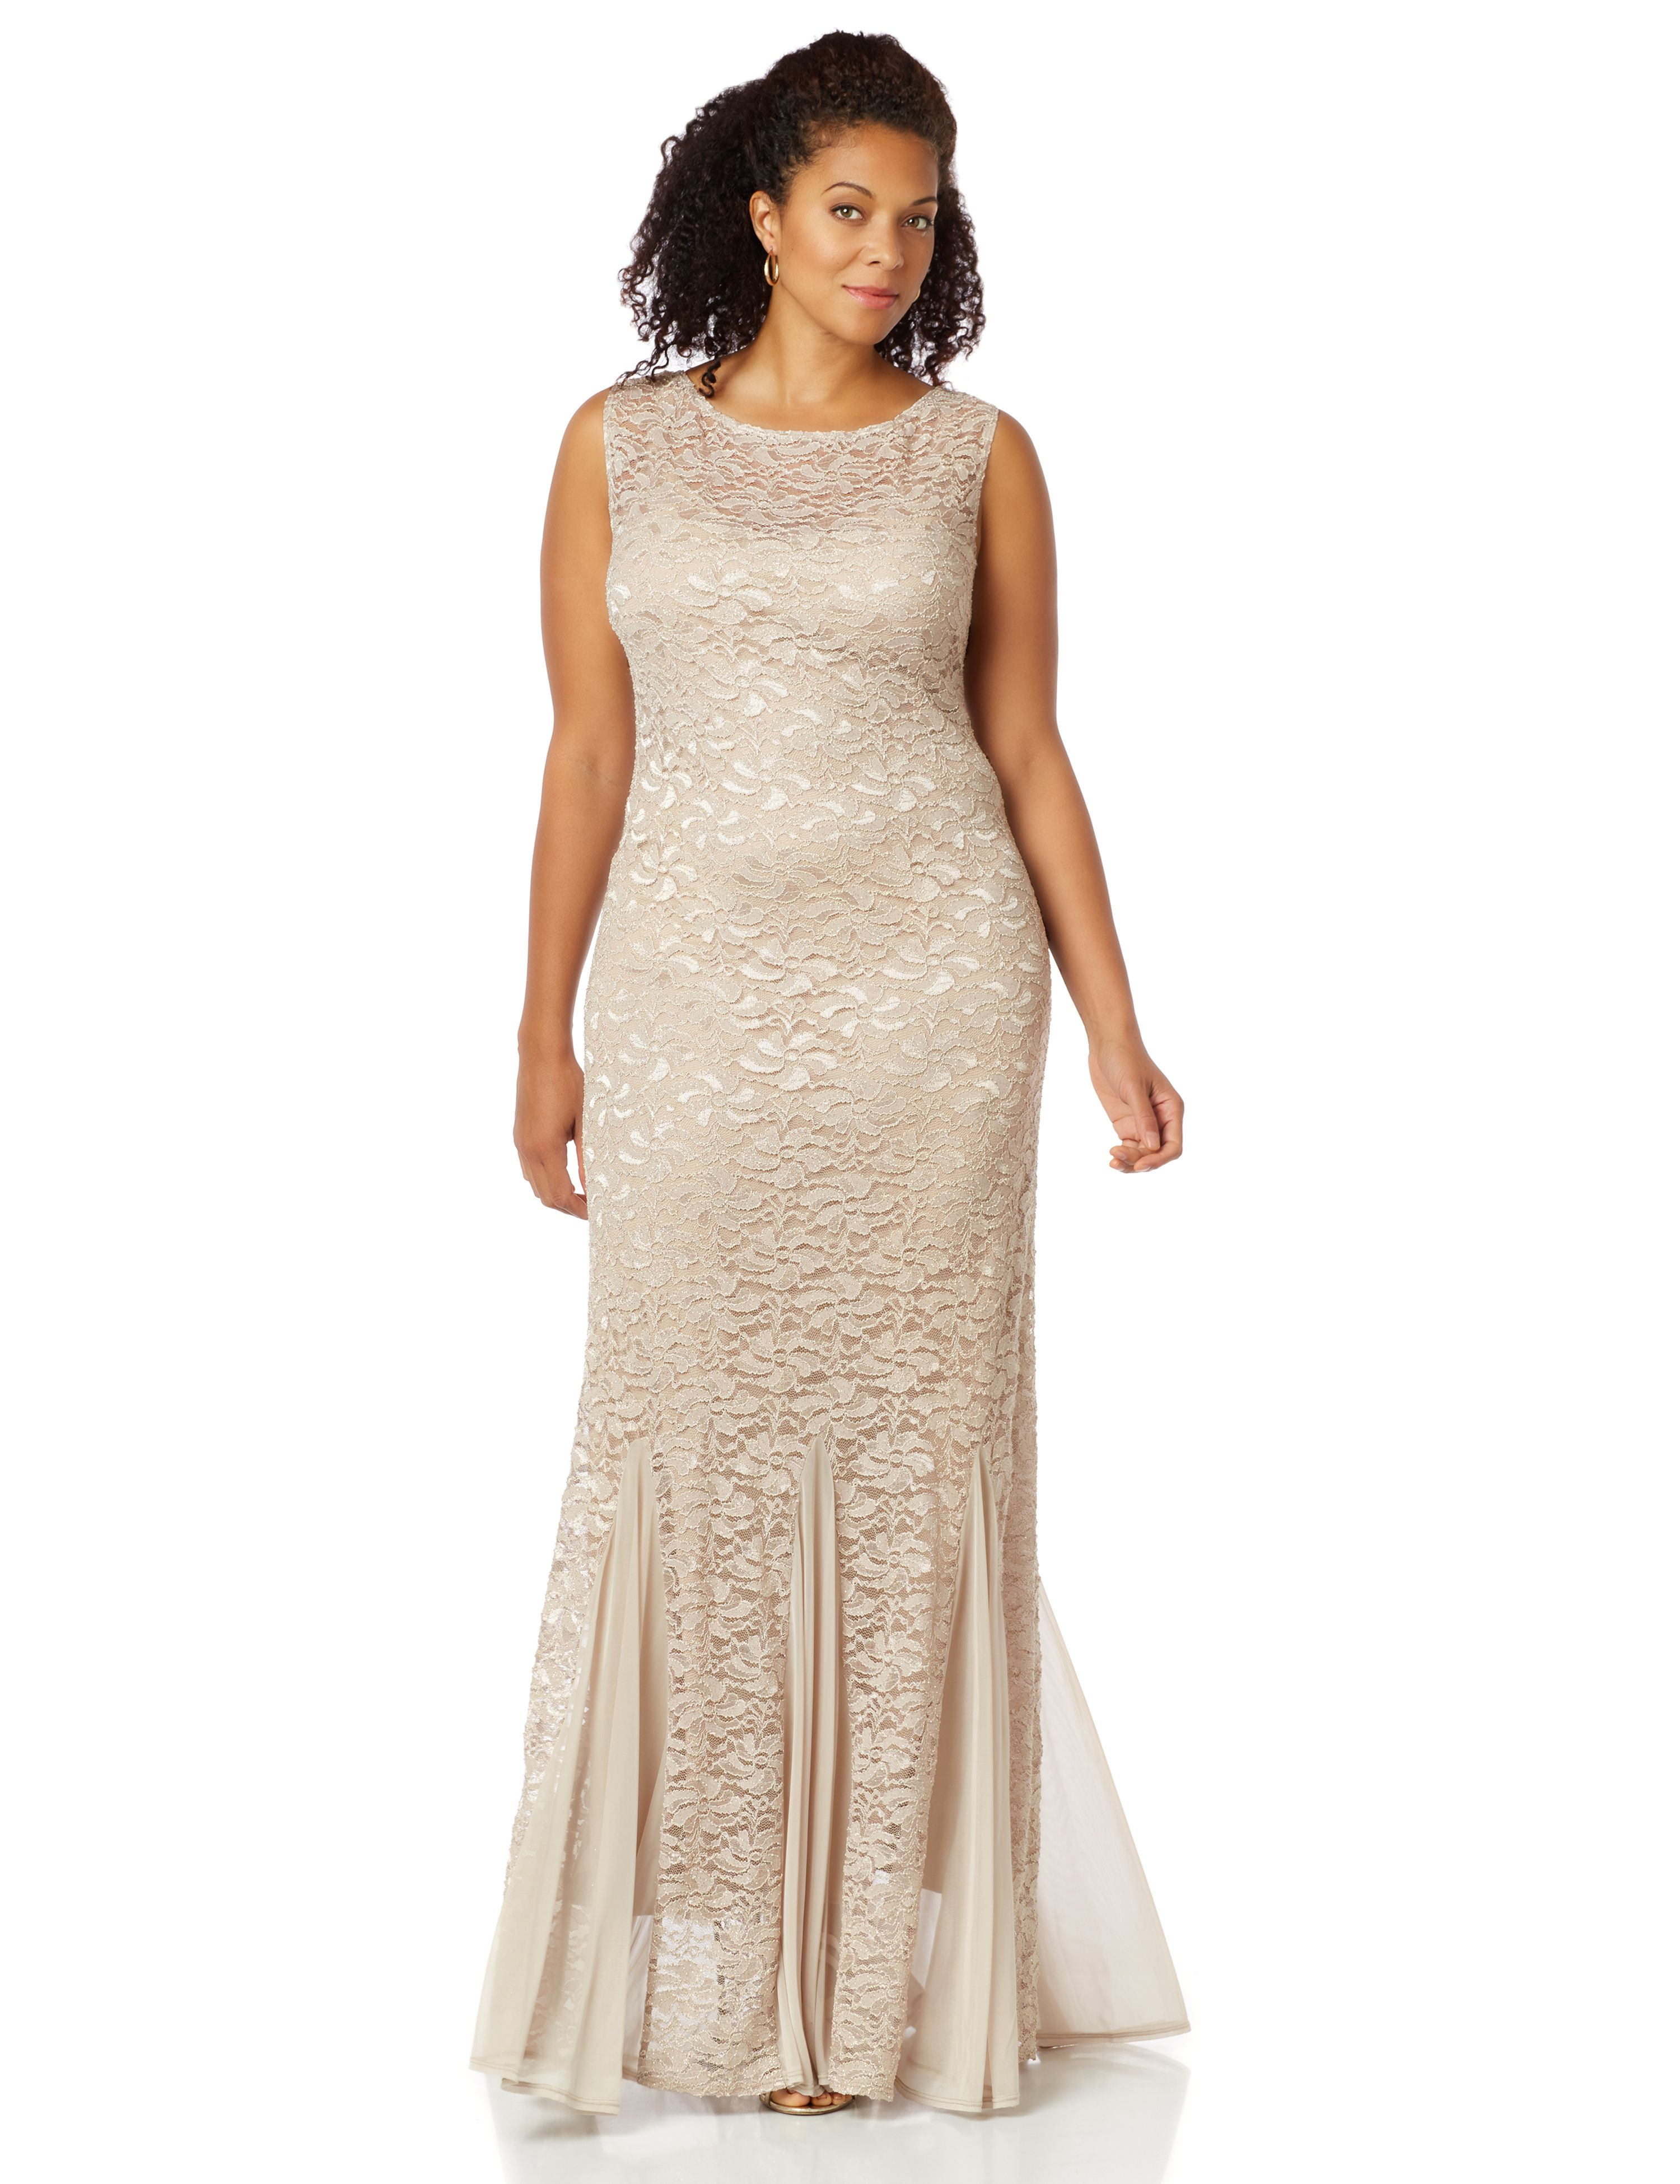 Plus size prom dresses madison wi